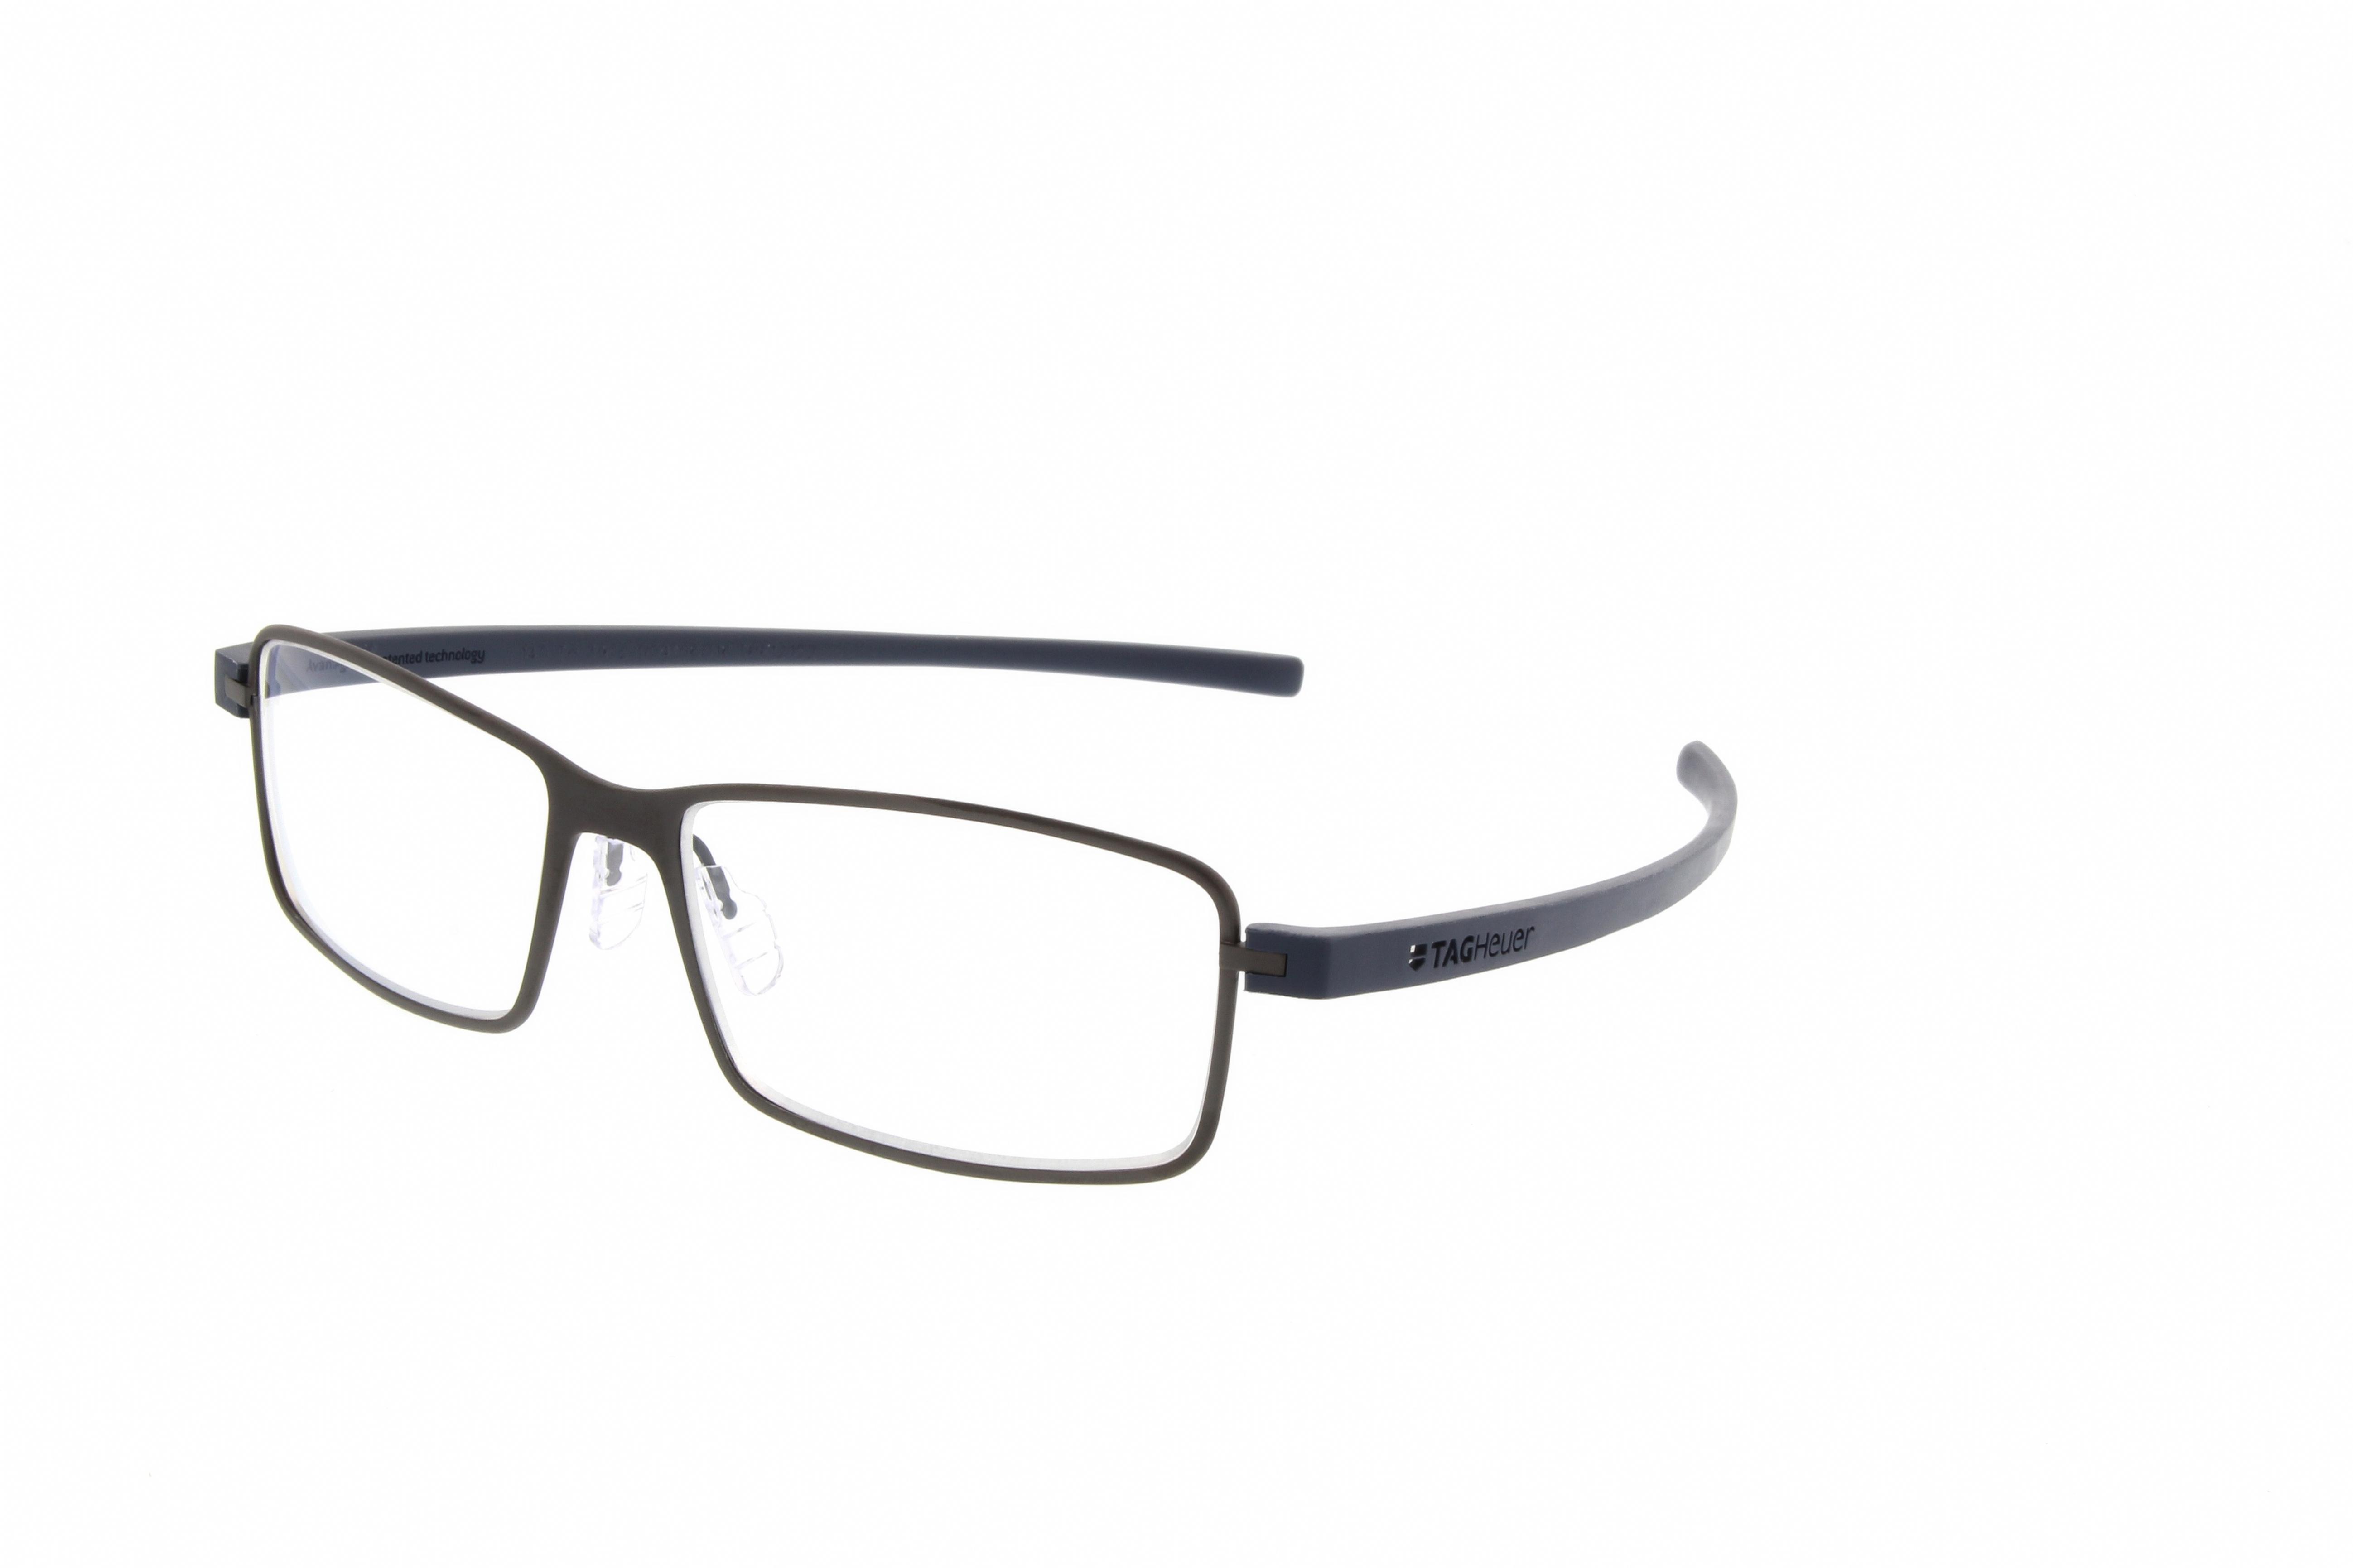 560f174c10 Tag Heuer 3902 Reflex 3 Rimmed Eyeglasses